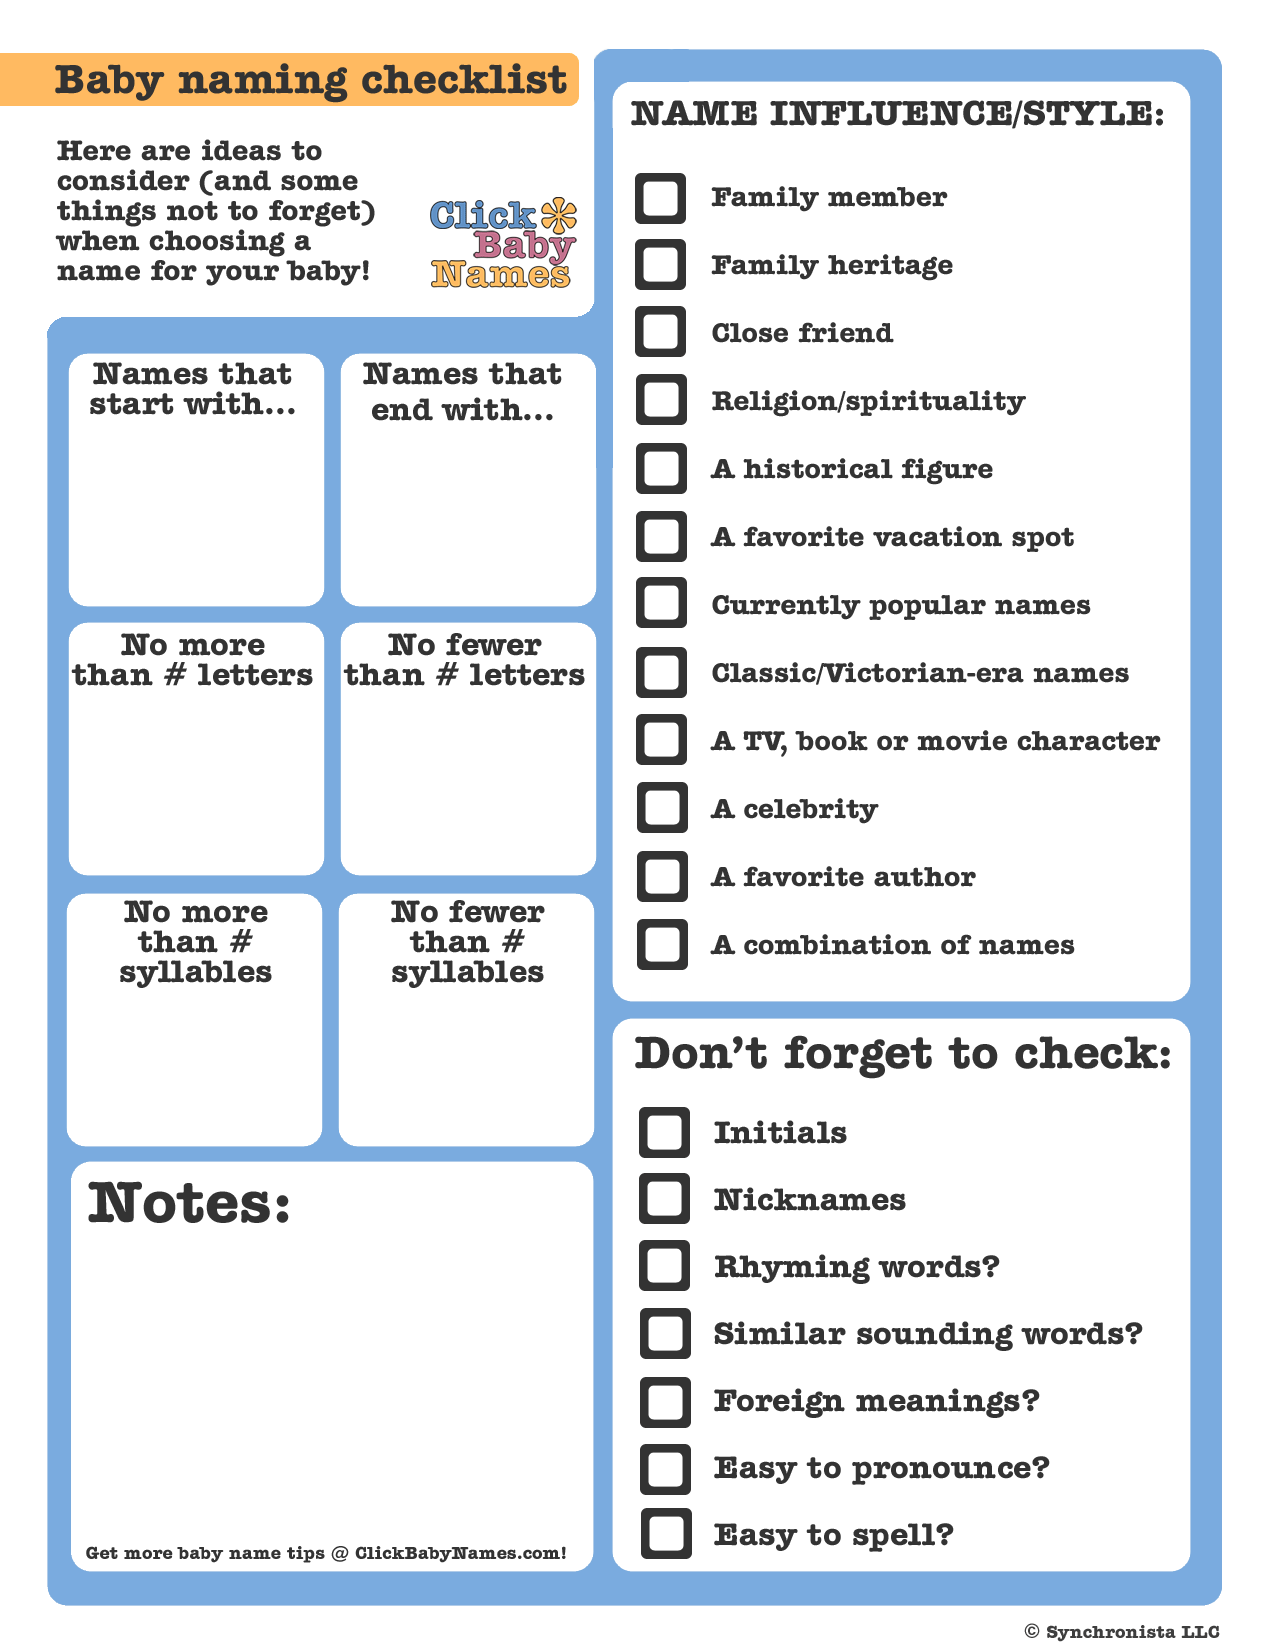 Printable baby name checklists - Click Baby Names